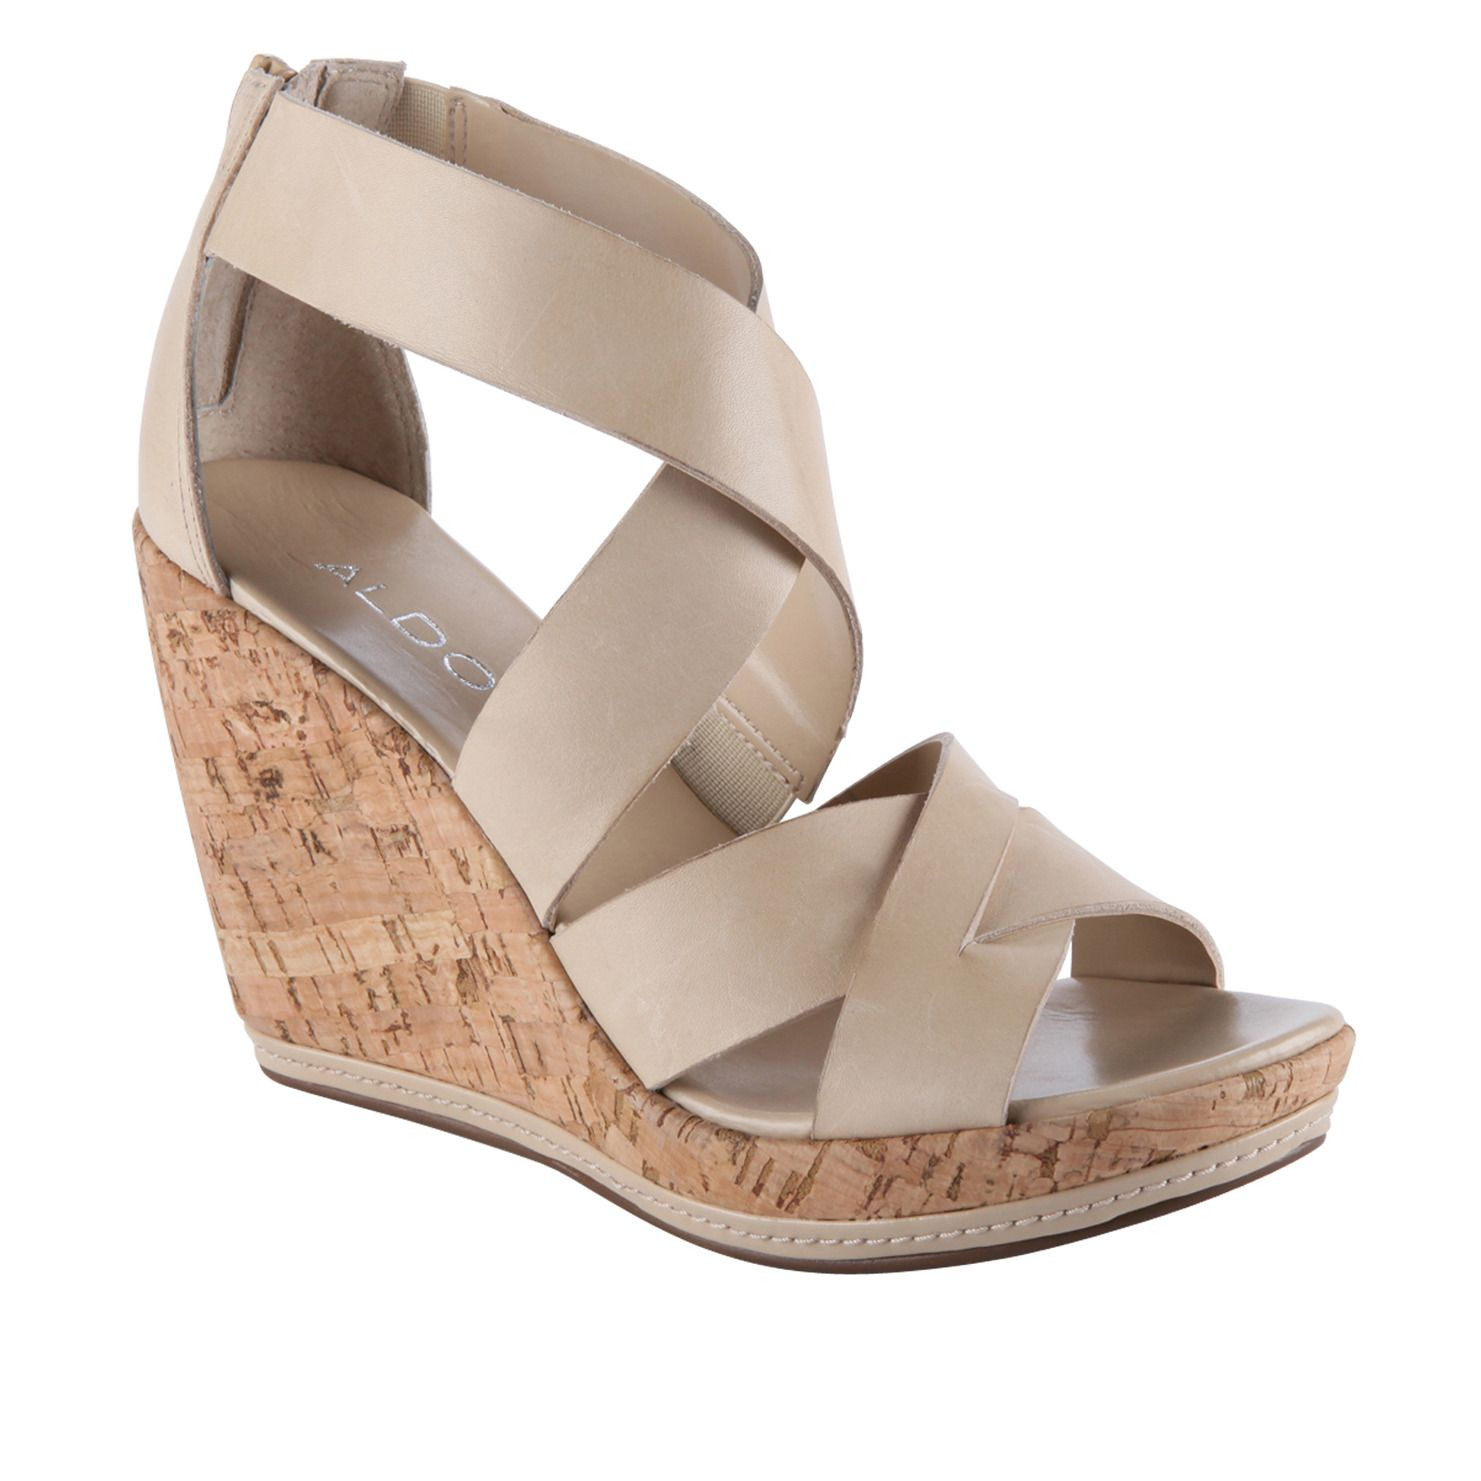 7e52d1a59b7 MORIKAWA - women s wedges sandals for sale at ALDO Shoes.